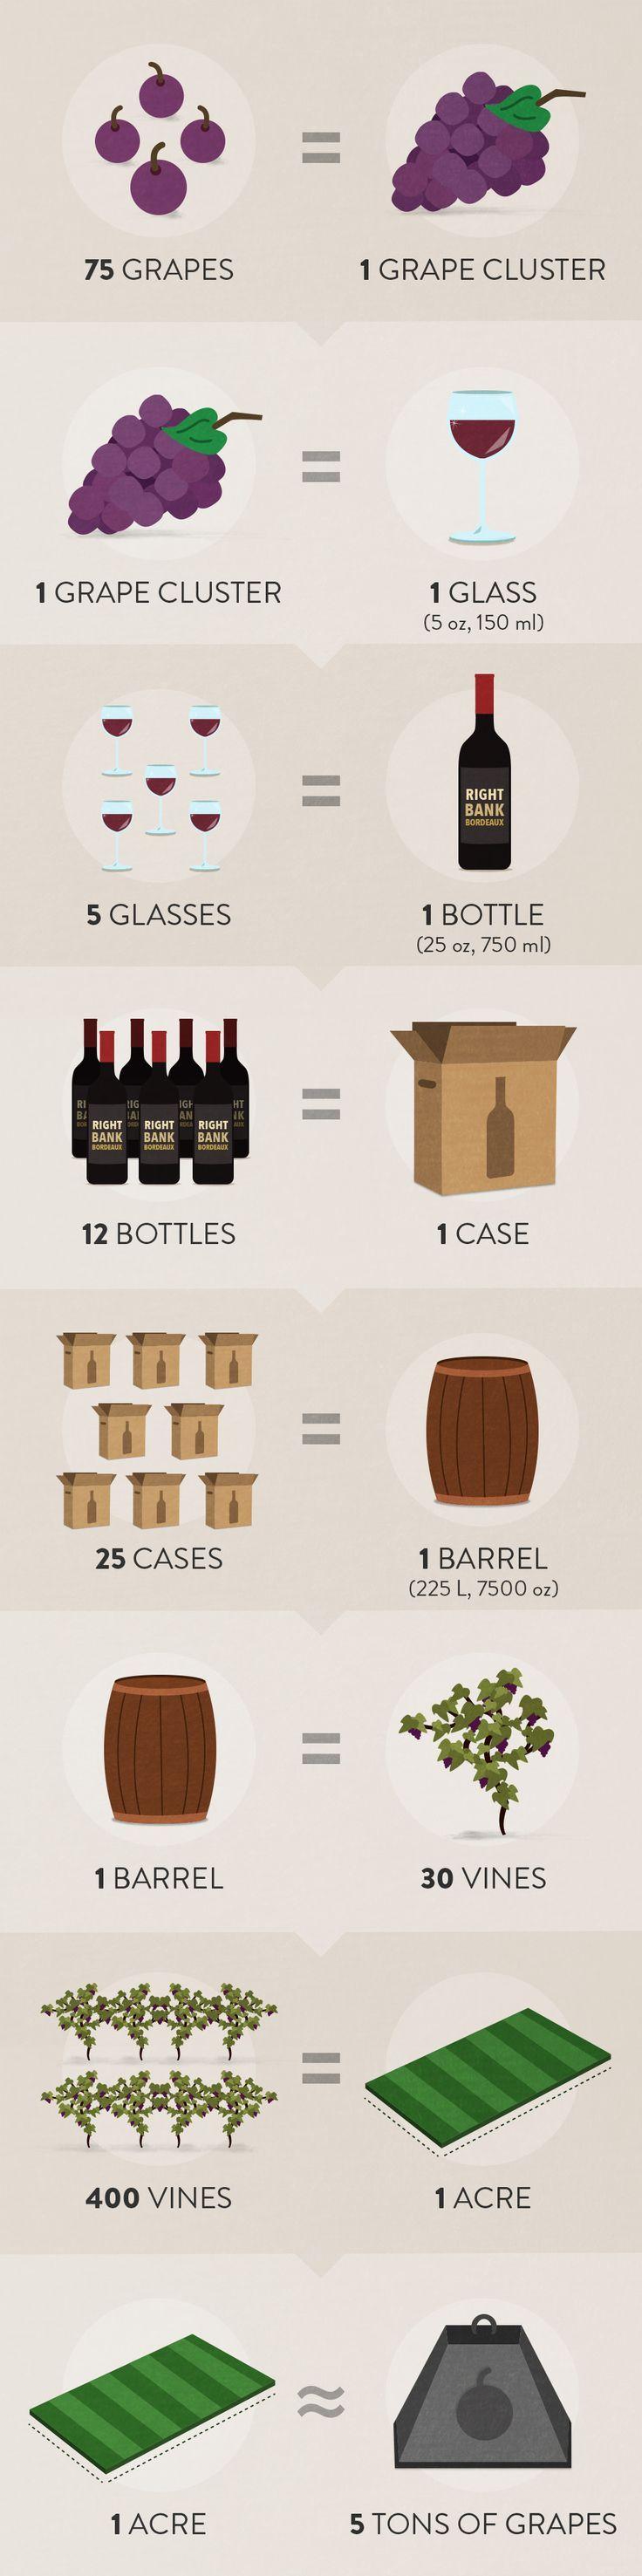 Wine math #infographic #wine #SouthAfrica www.winewizard.co.za/